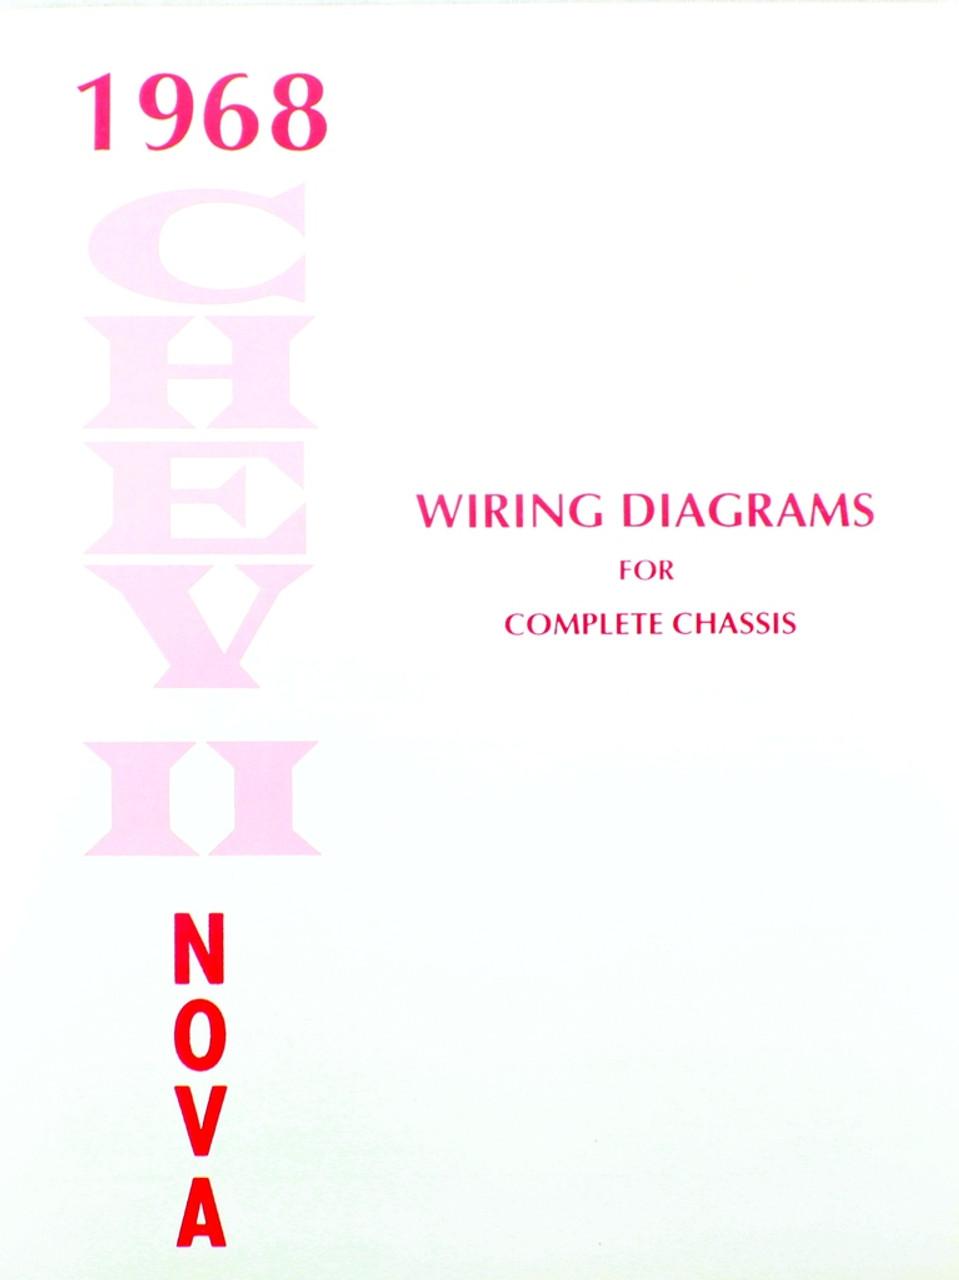 L1912_zpsn8fjinxx__40966.1507329294?c=2 68 1968 chevy nova electrical wiring diagram manual i 5 classic 1968 nova wiring harness at creativeand.co